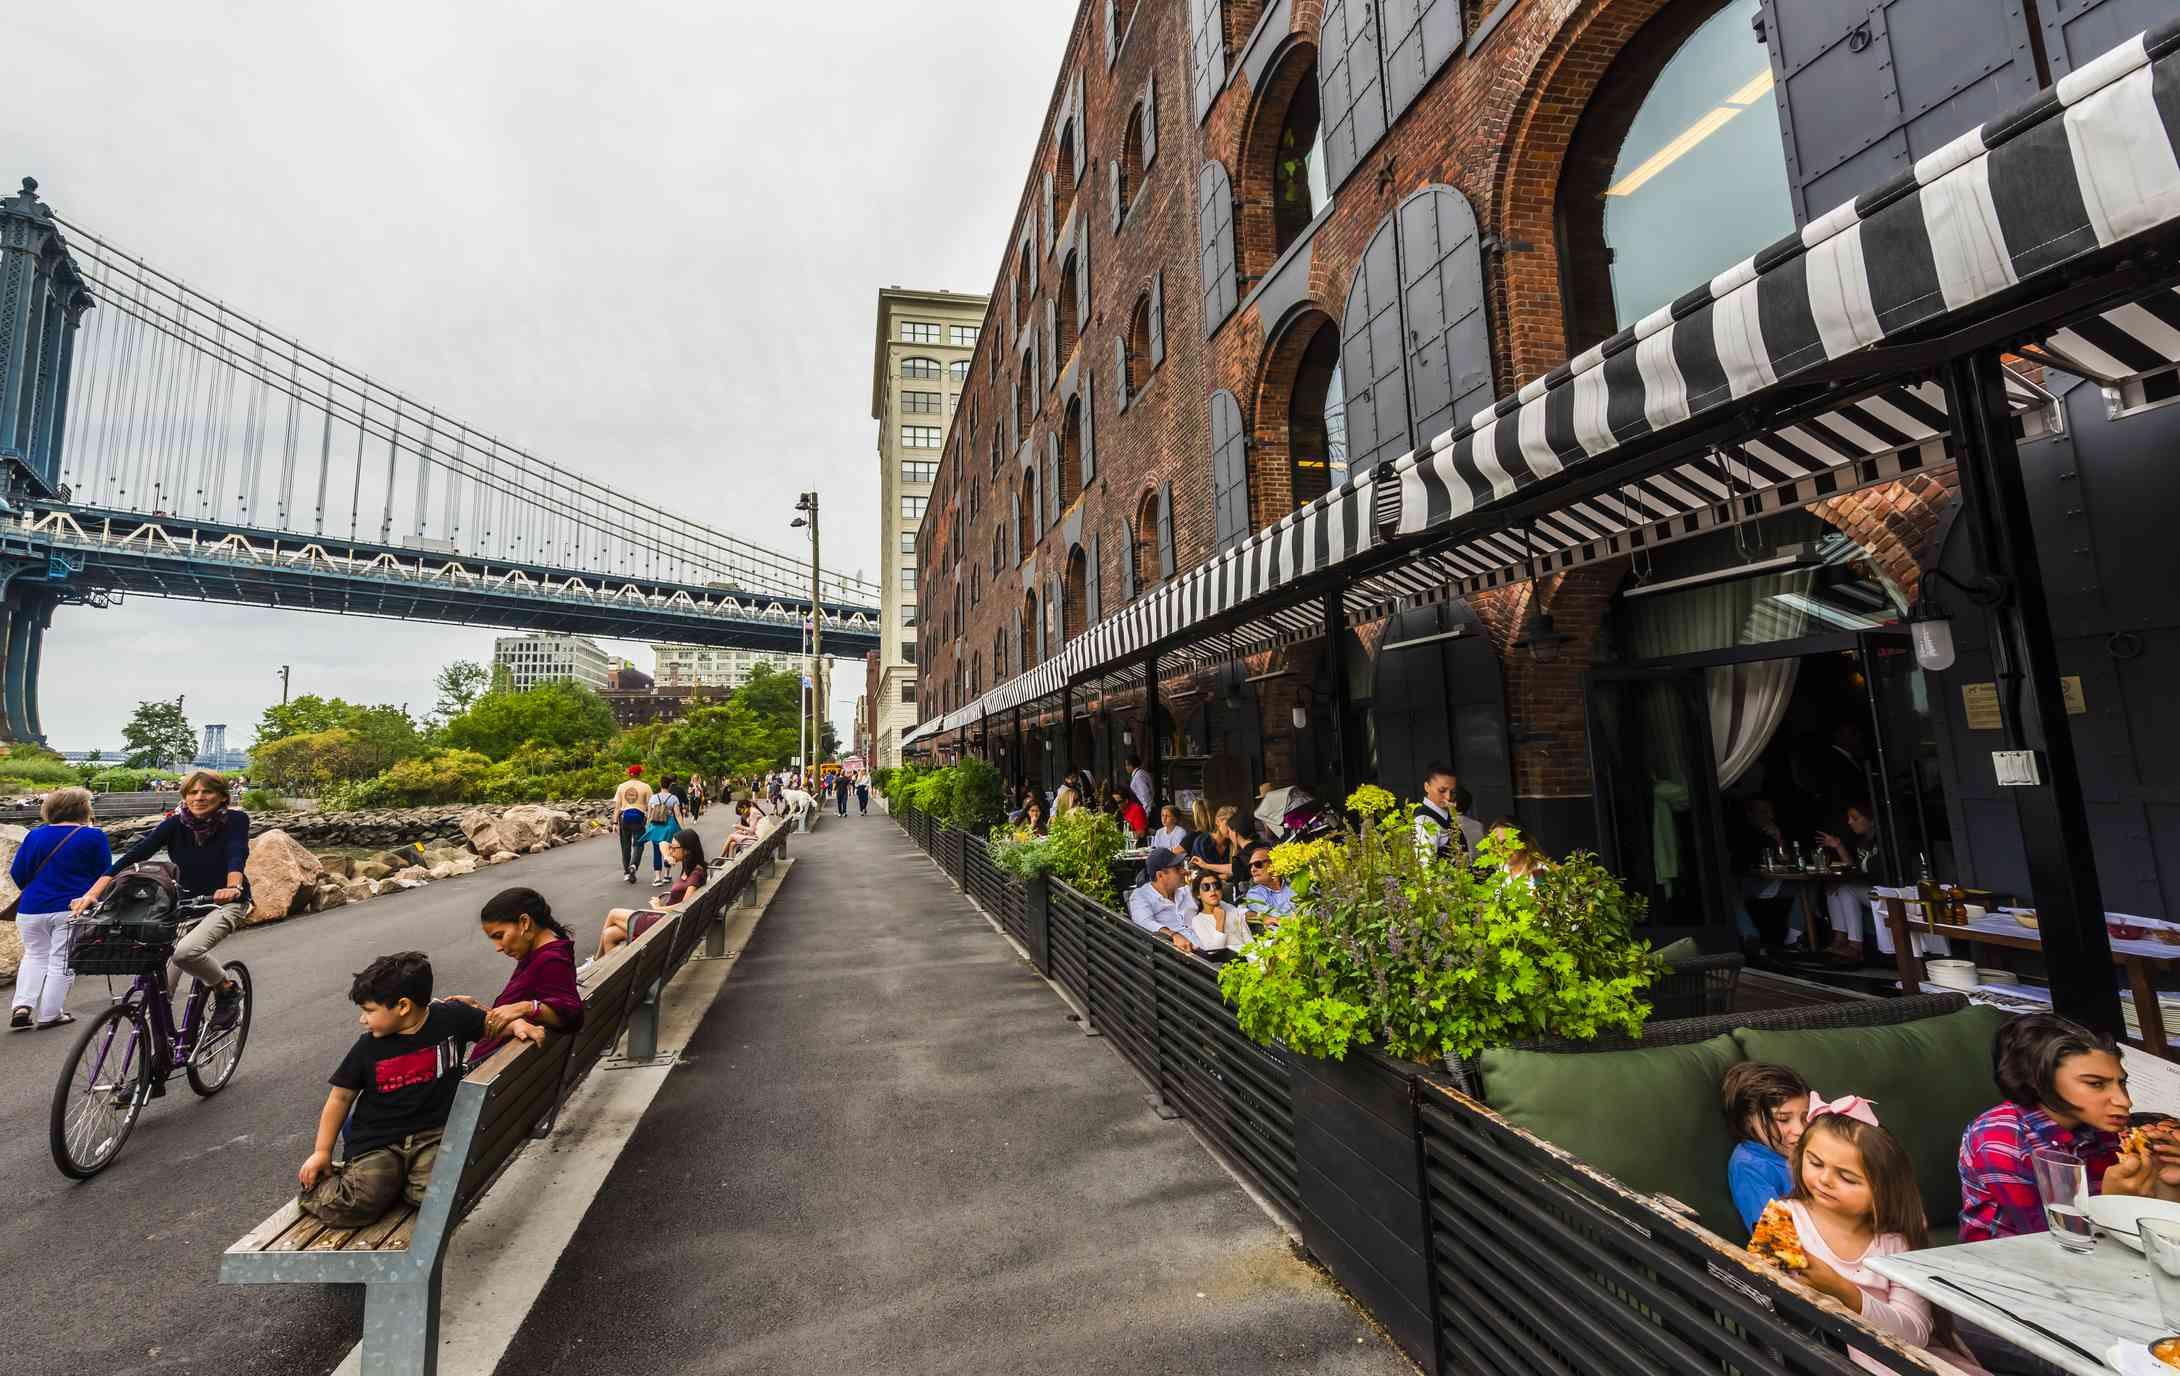 Cicoone's Restaurant, with Manhattan Bridge on left, DUMBO (Down Under the Manhattan Bridge Overpass), Brooklyn, New York USA